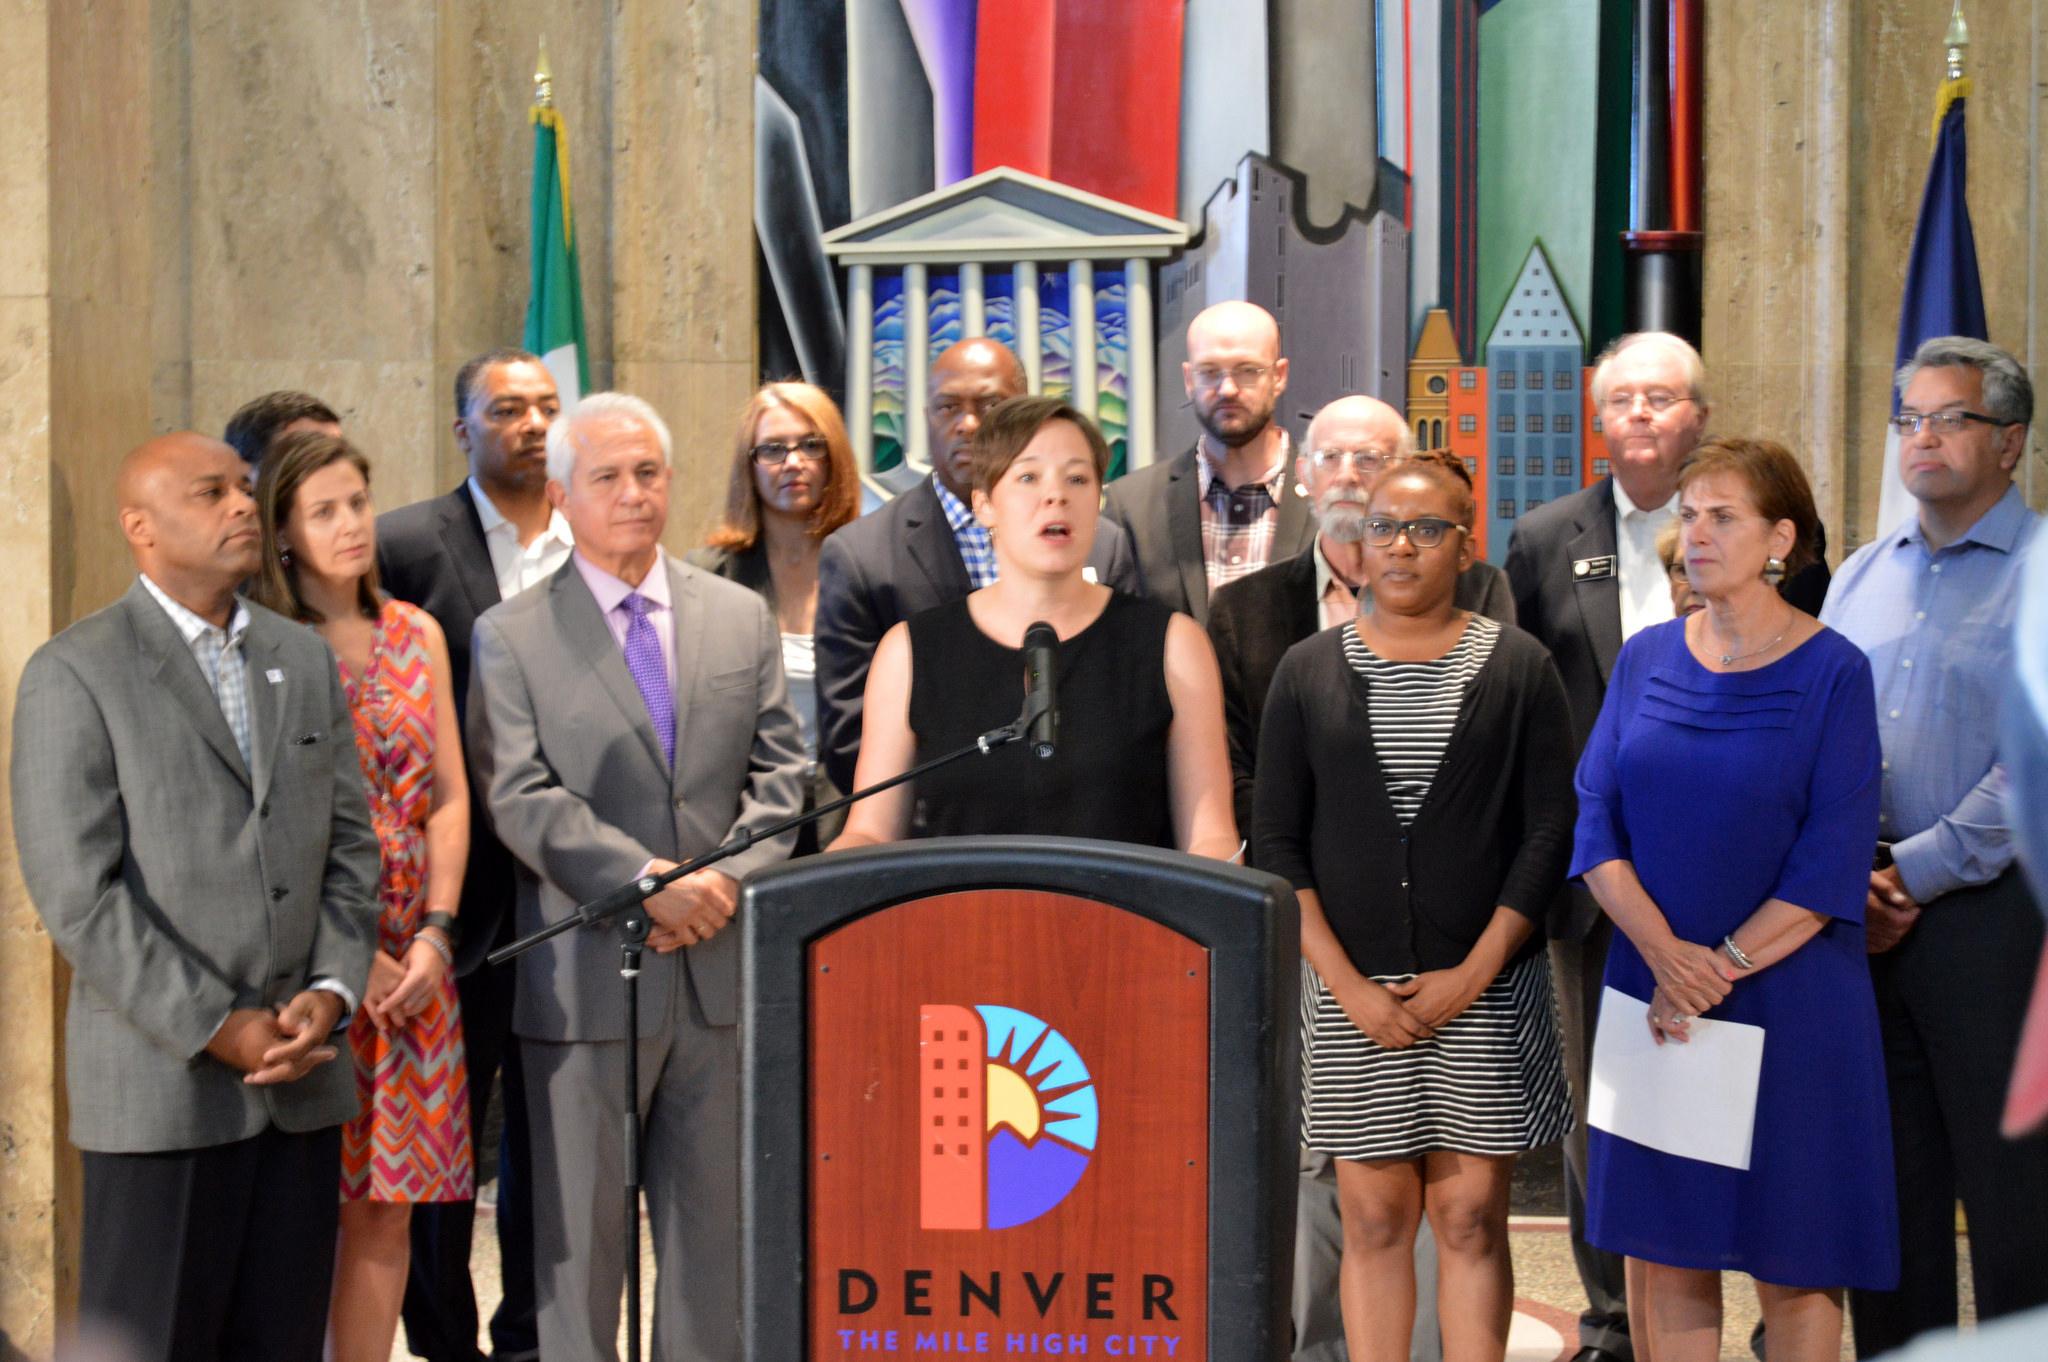 Denver Establishes a $150 Million Housing Trust Fund to Drive City Housing Plan